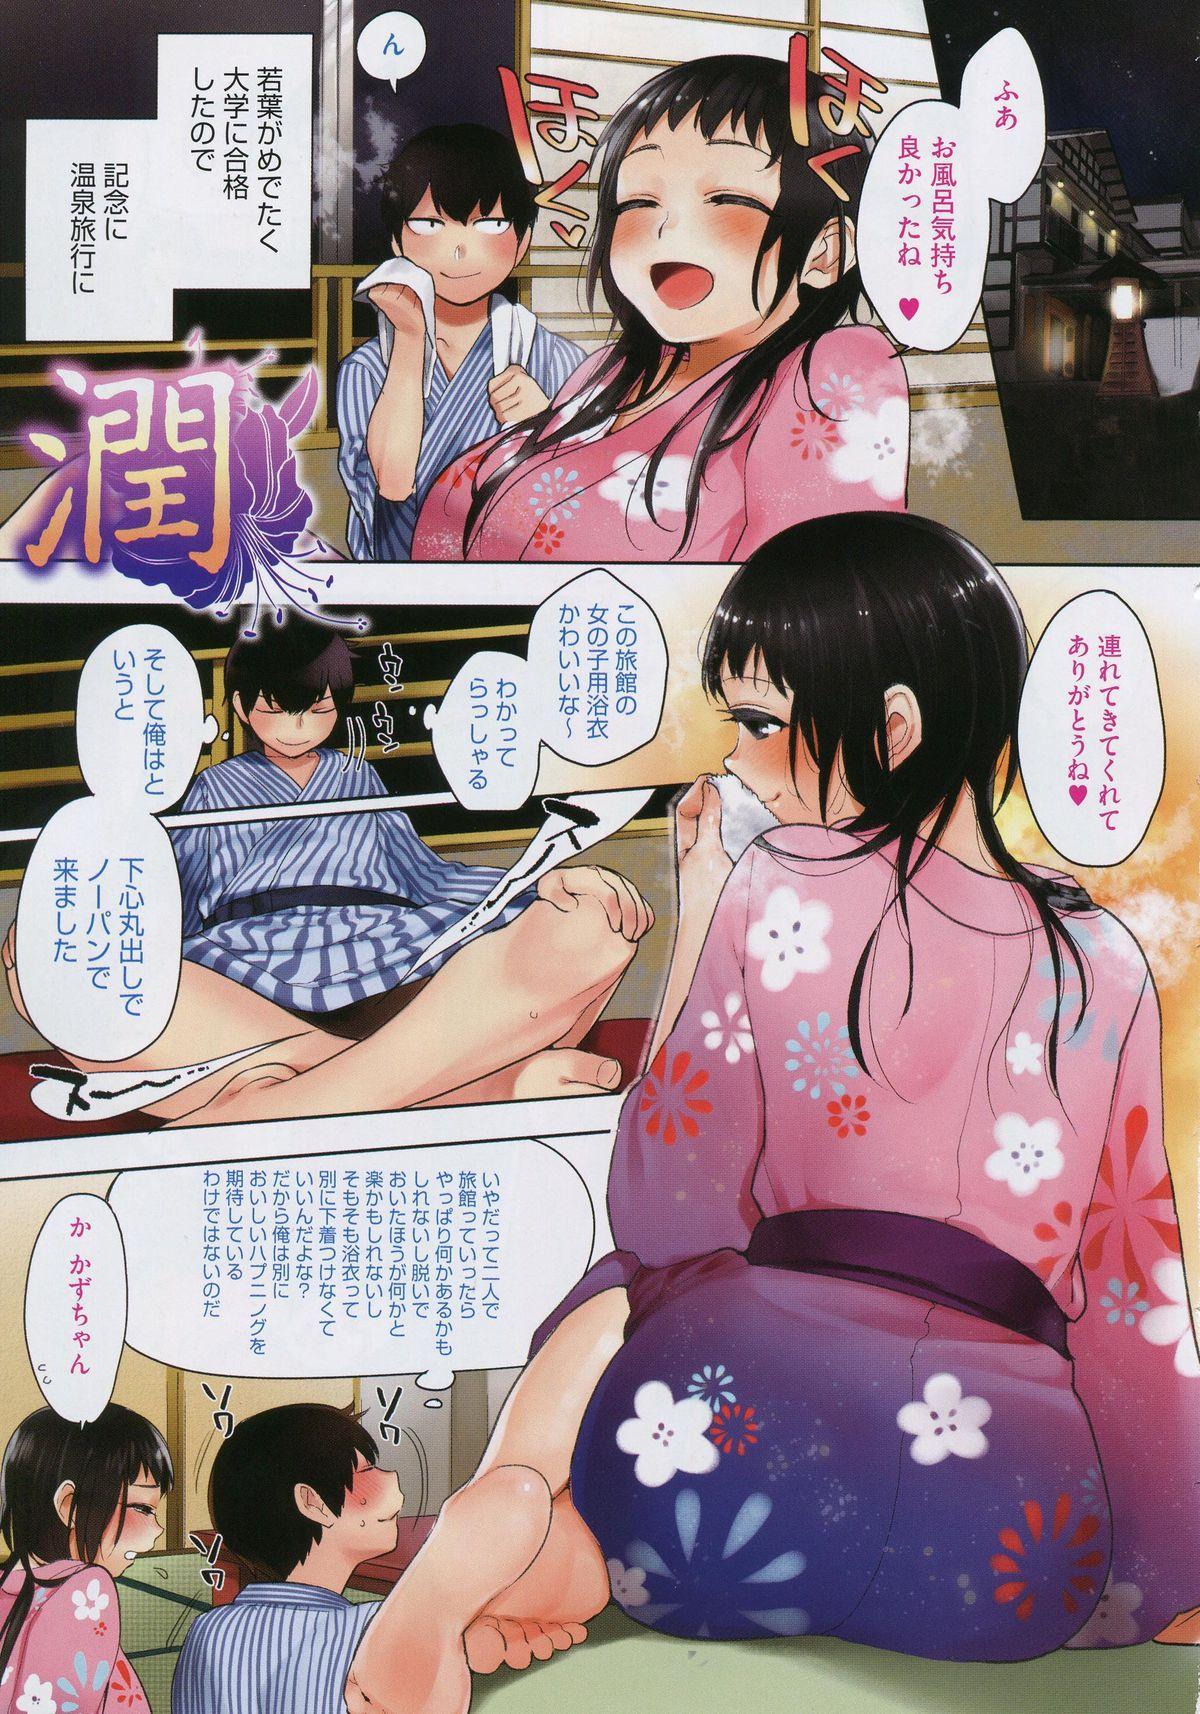 Boku Dake no Yuuyami - Only My Twilight 5